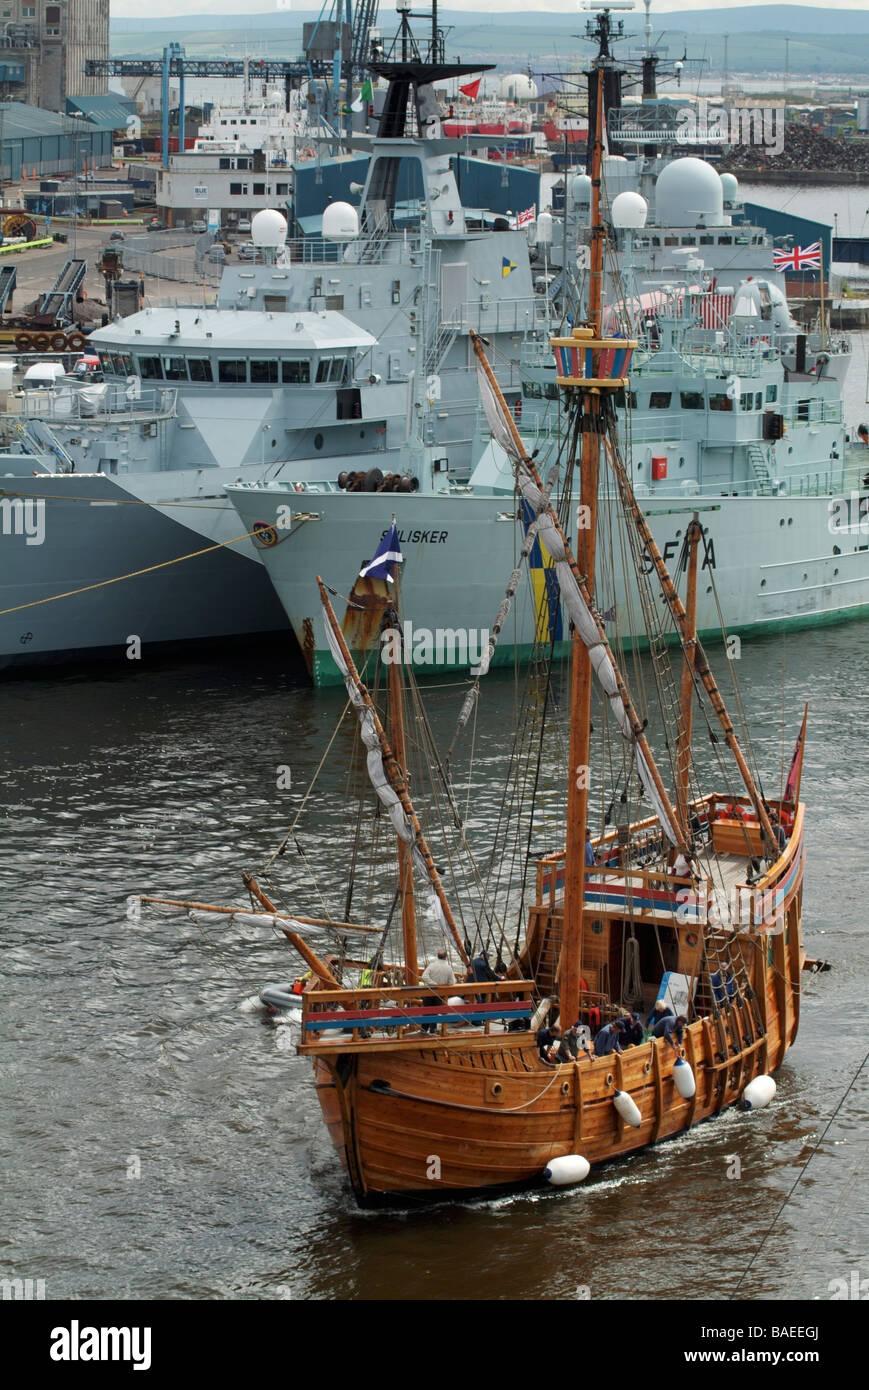 Caravel the 'Matthew of Bristol' arriving in Leith Docks, Edinburgh, Scotland, UK - Stock Image